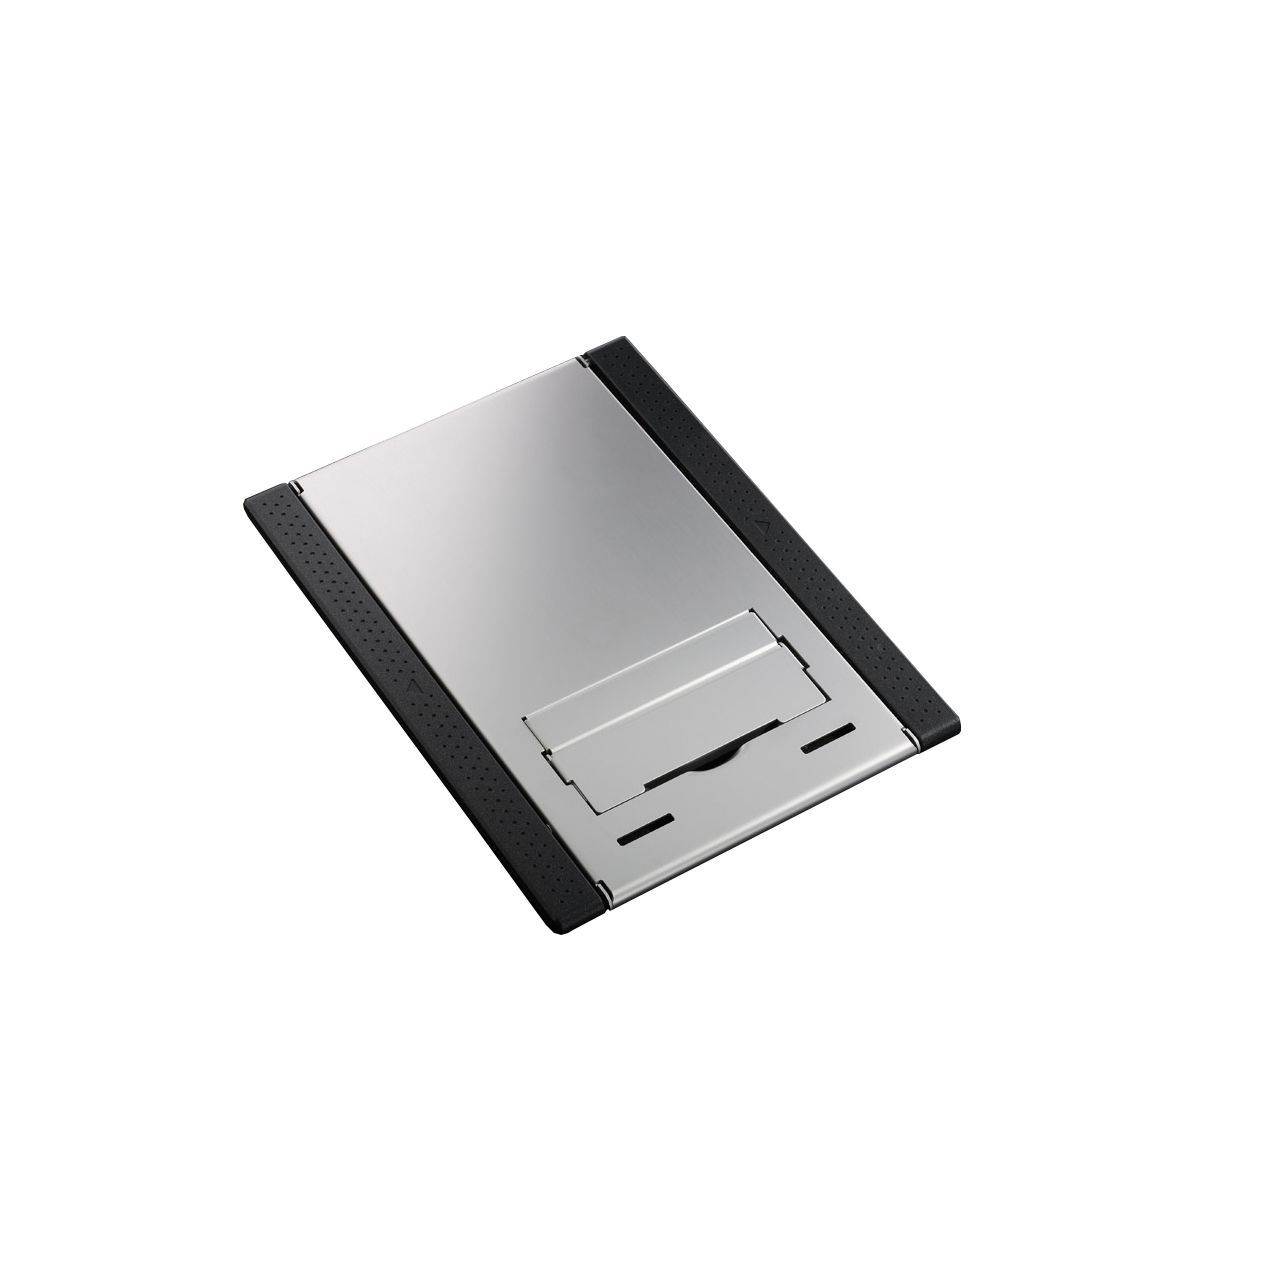 ergostar laptopstand flexible laptophouder ERKASC01 ingeklapt